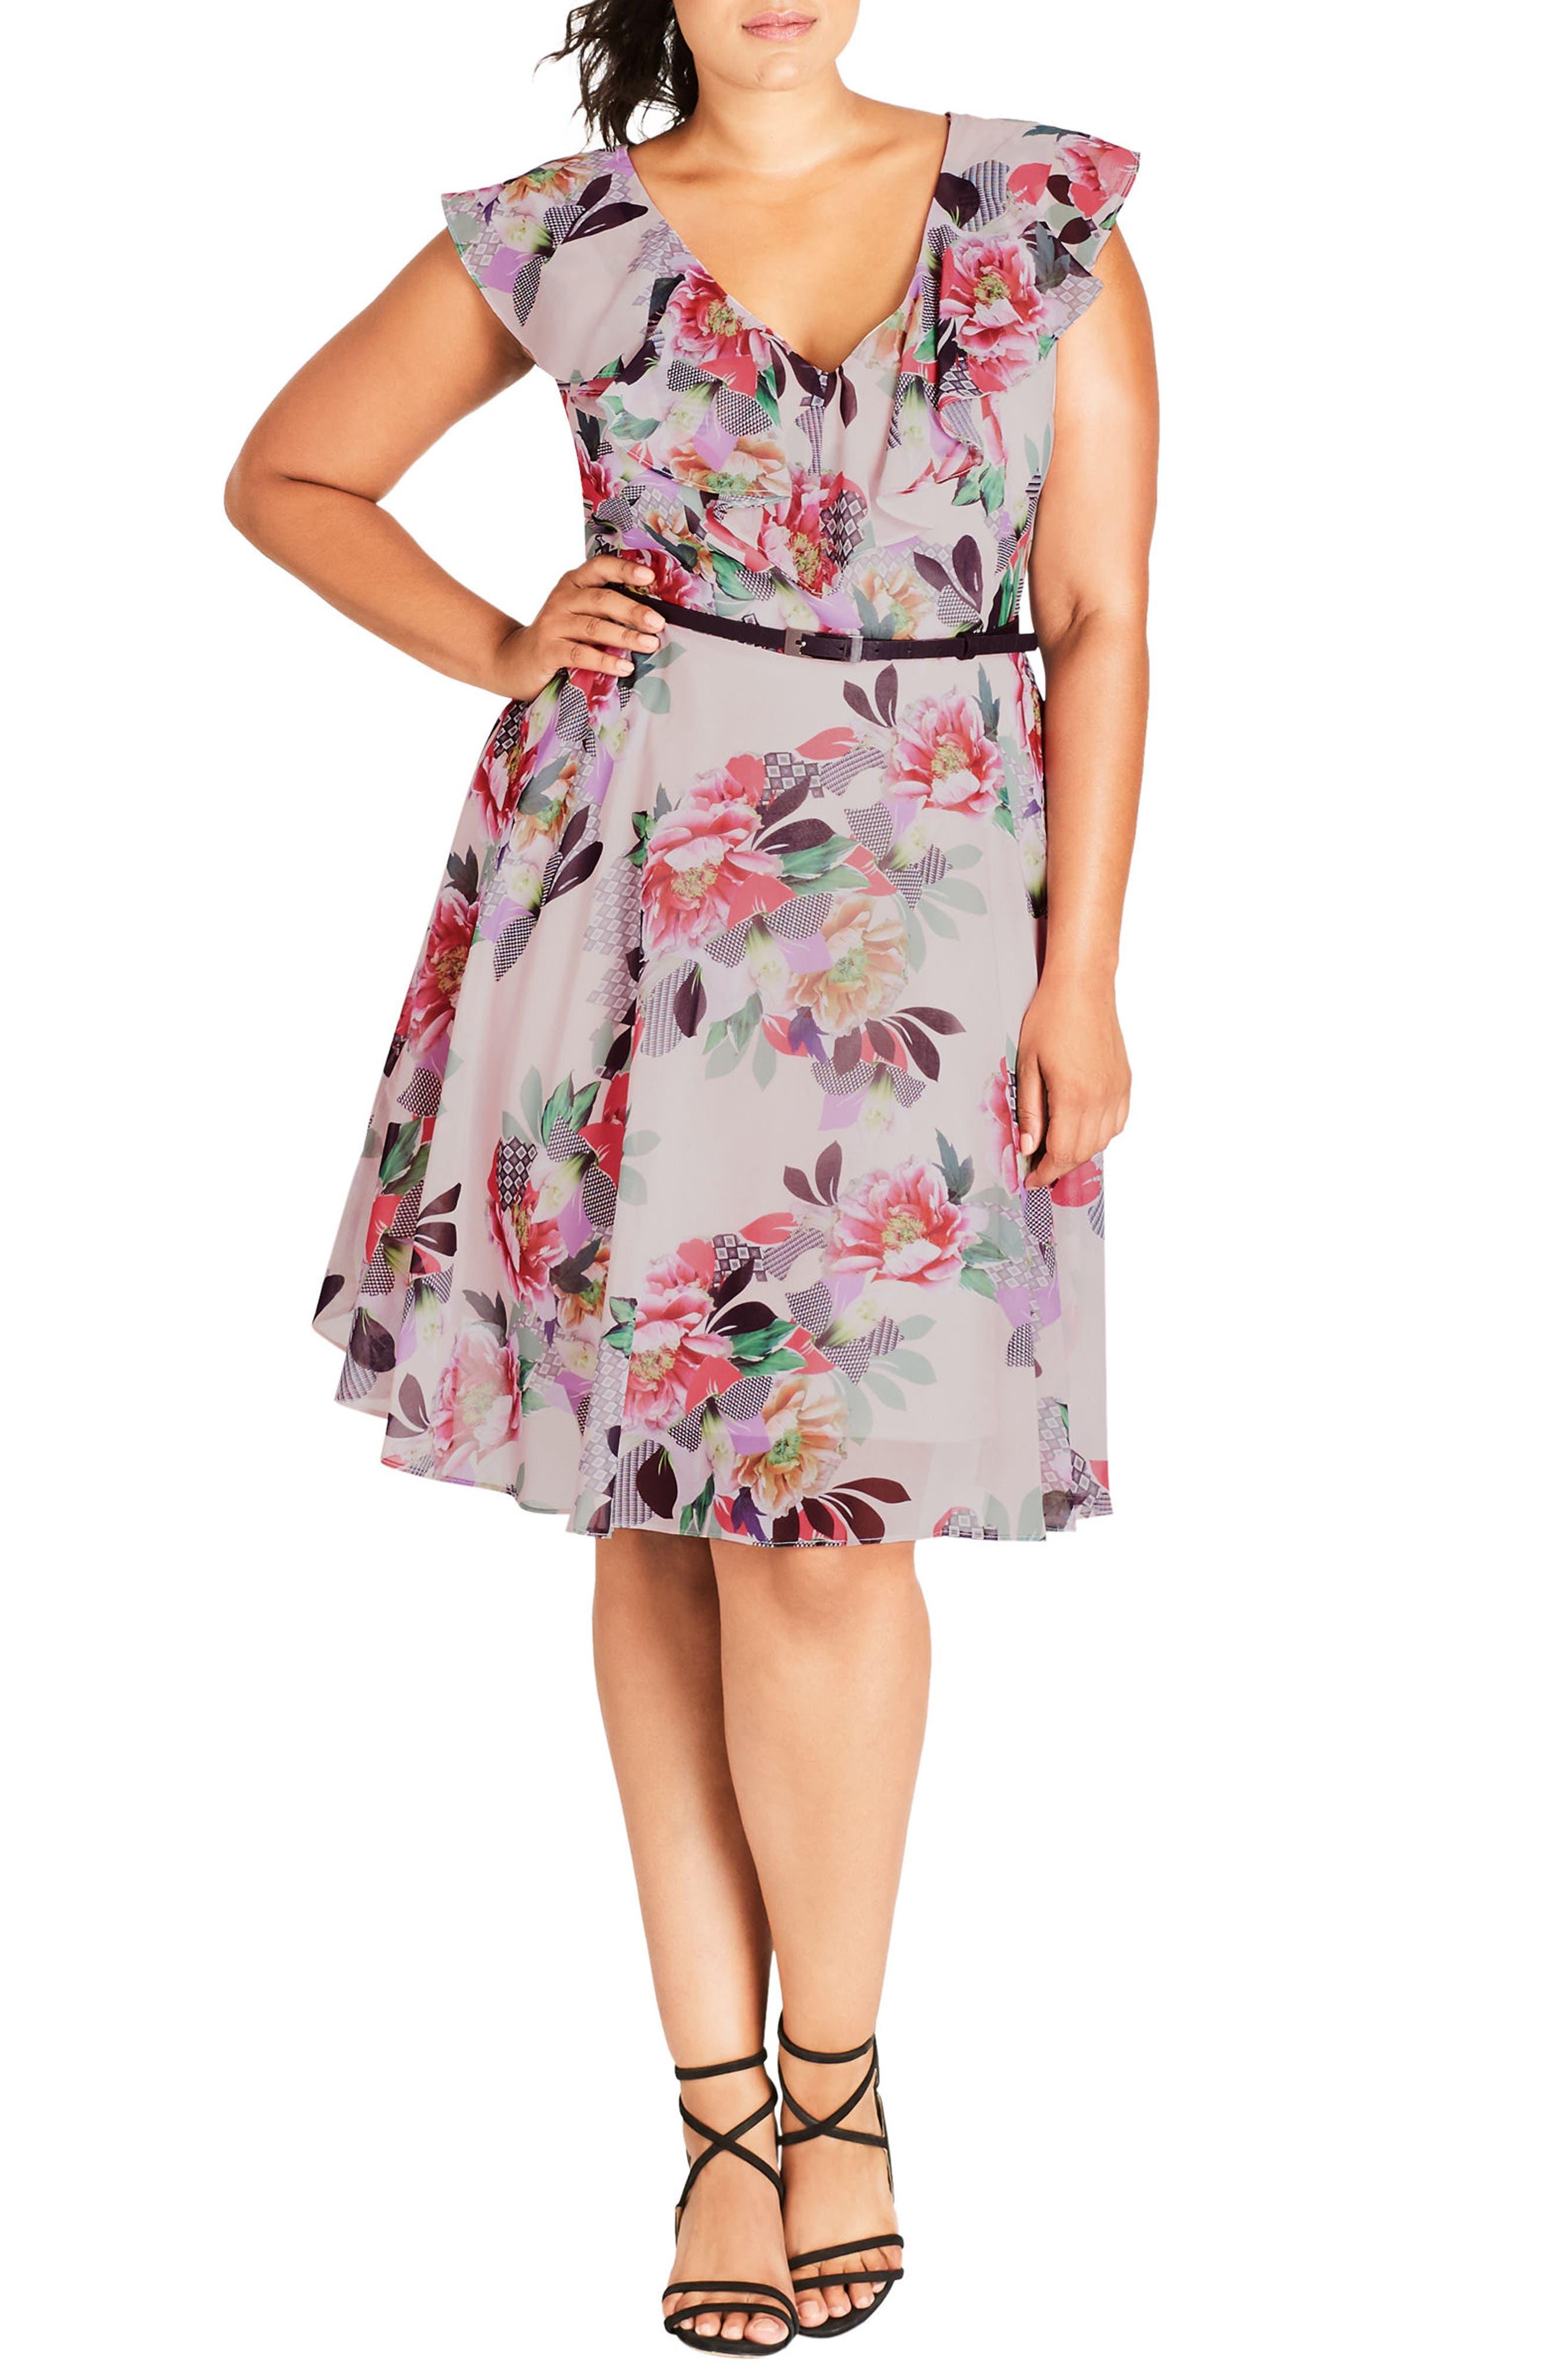 Romance Ruffle Floral Fit & Flare Dress,                             Main thumbnail 1, color,                             Lipstick Floral